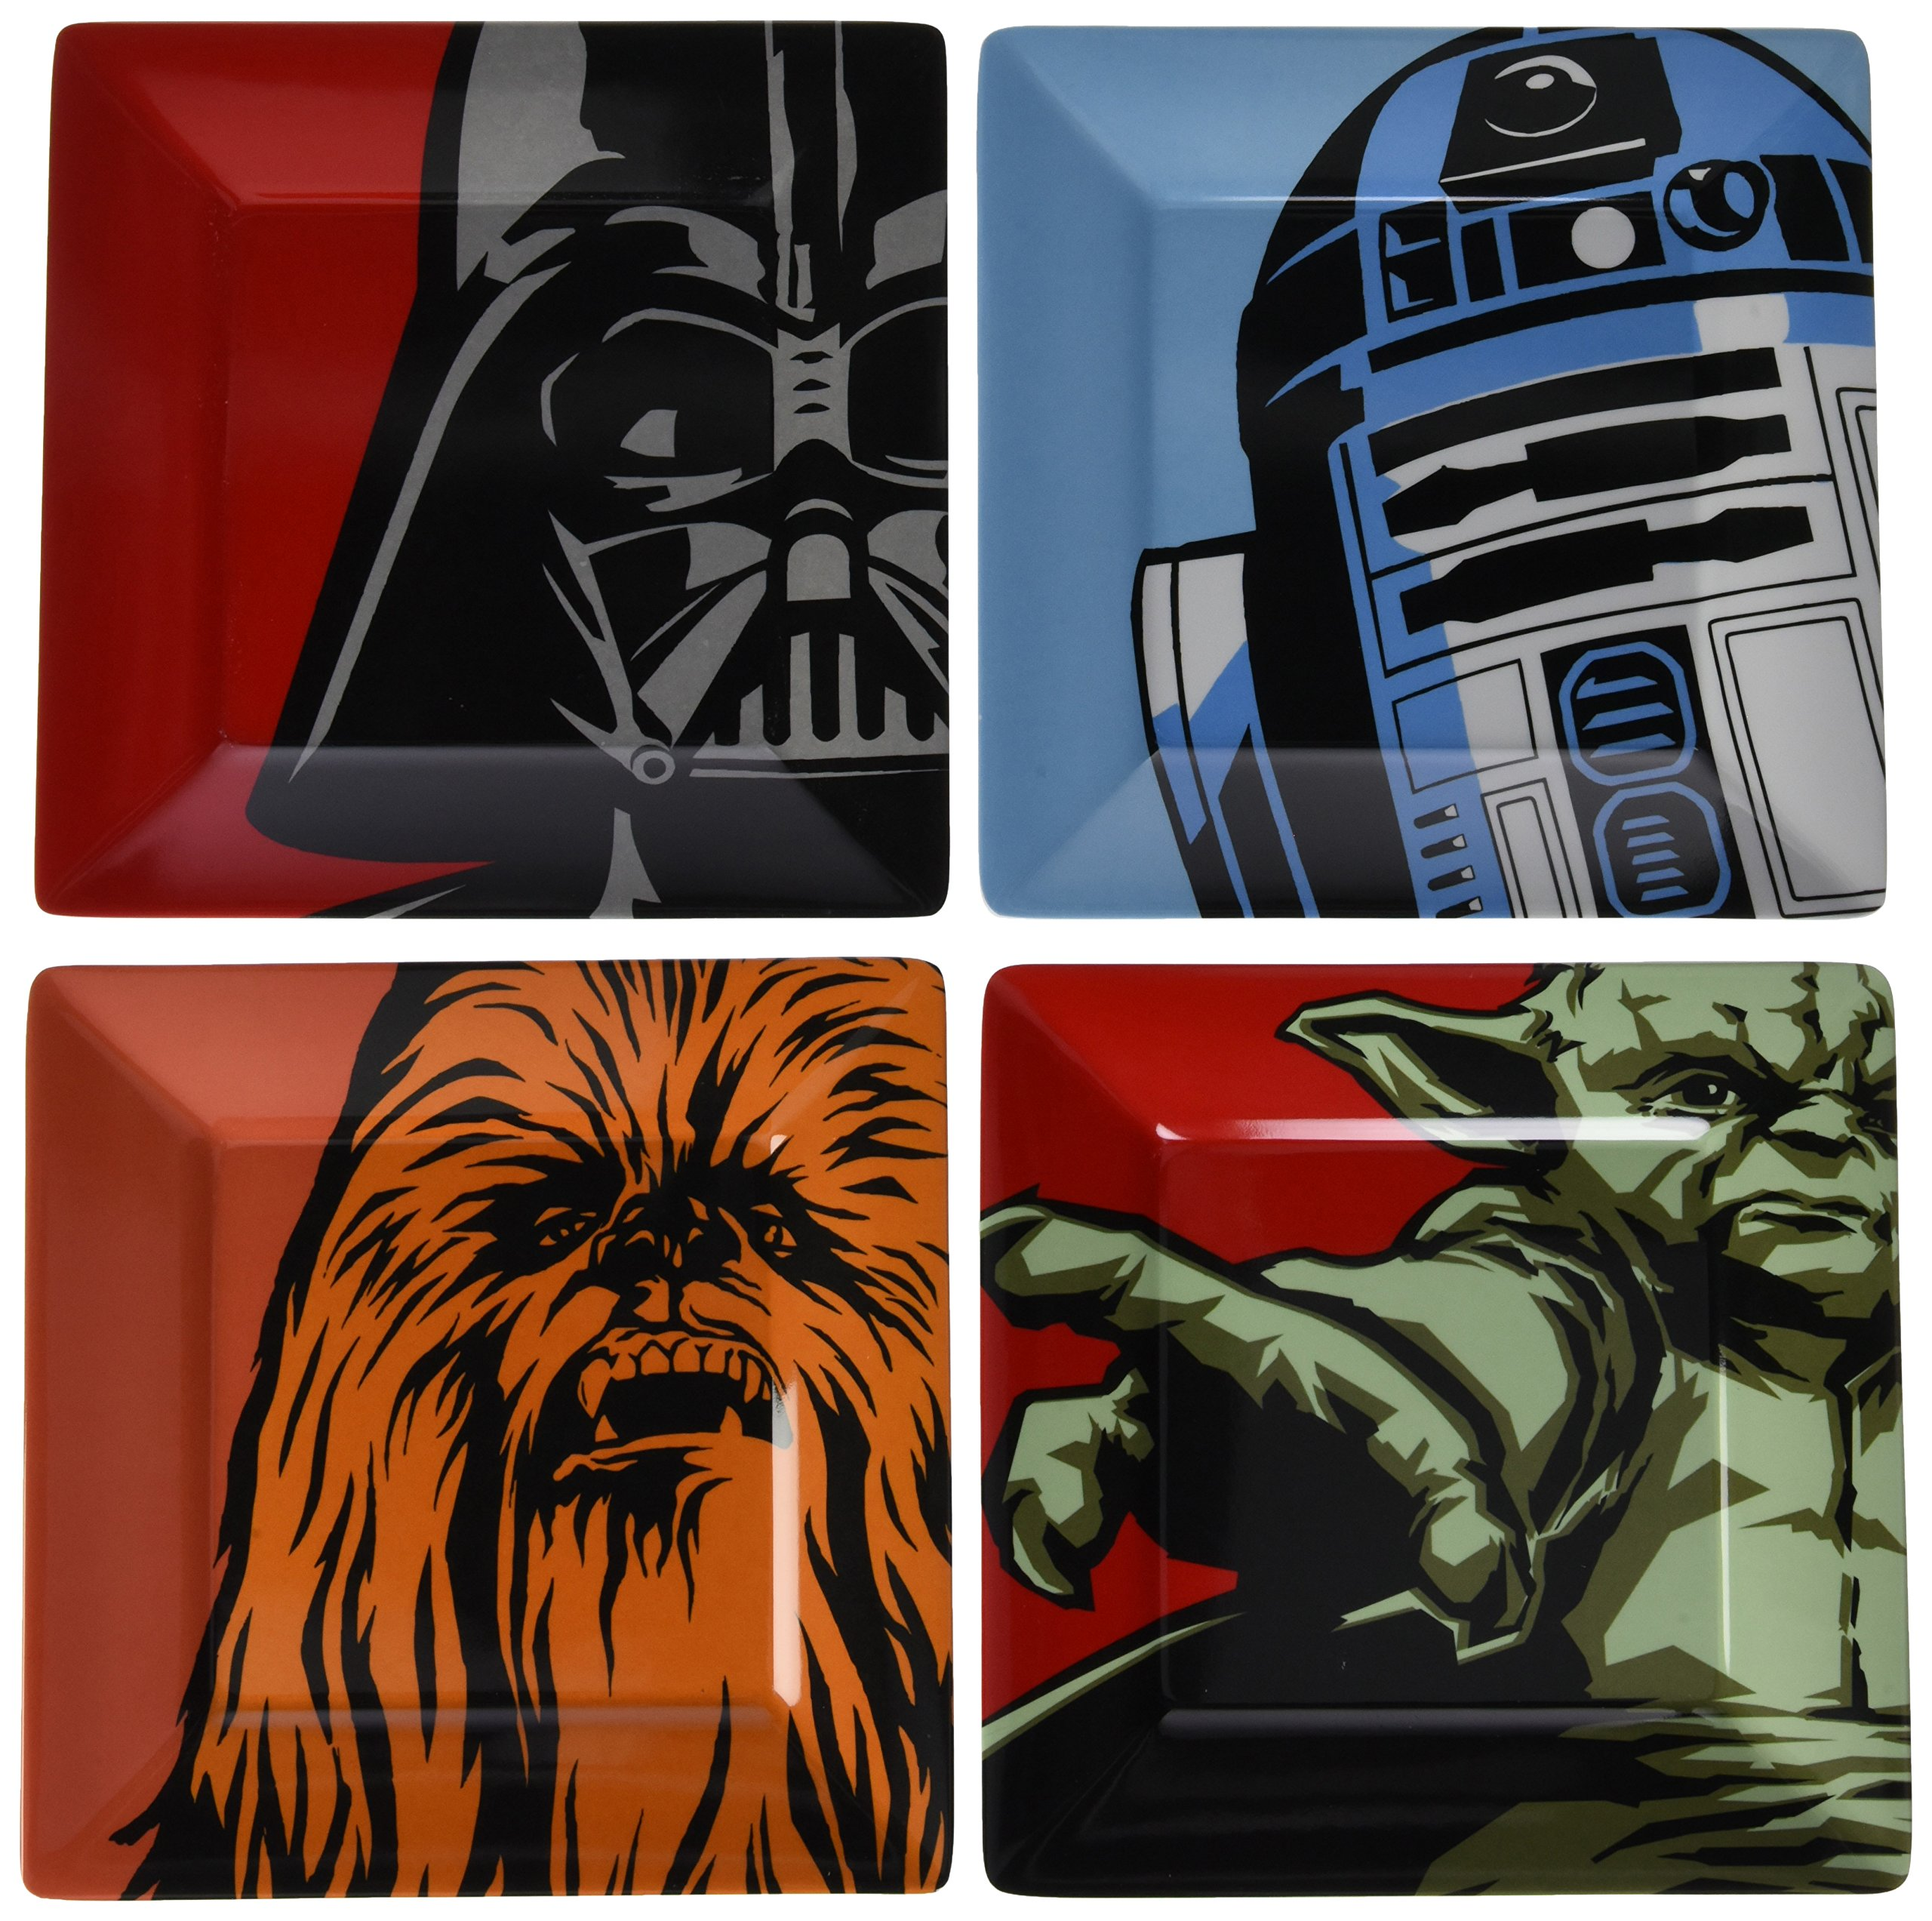 Star Wars Plate Set (Melamine)/Melamine 4PK Classic Characters